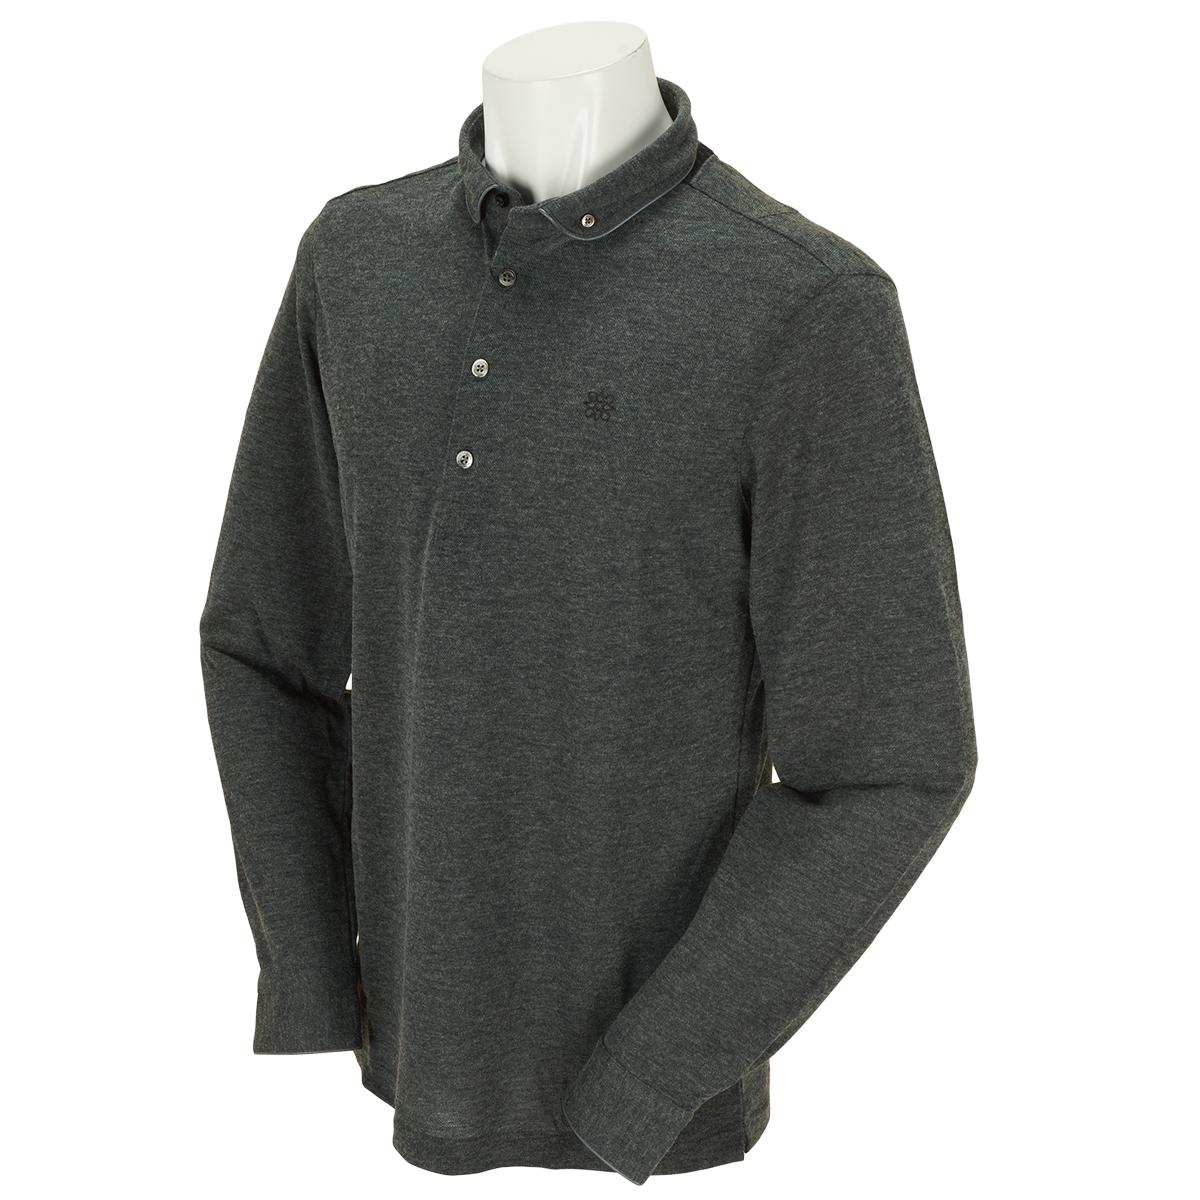 BlackLabel COOL MAX鹿の子長袖ポロシャツ